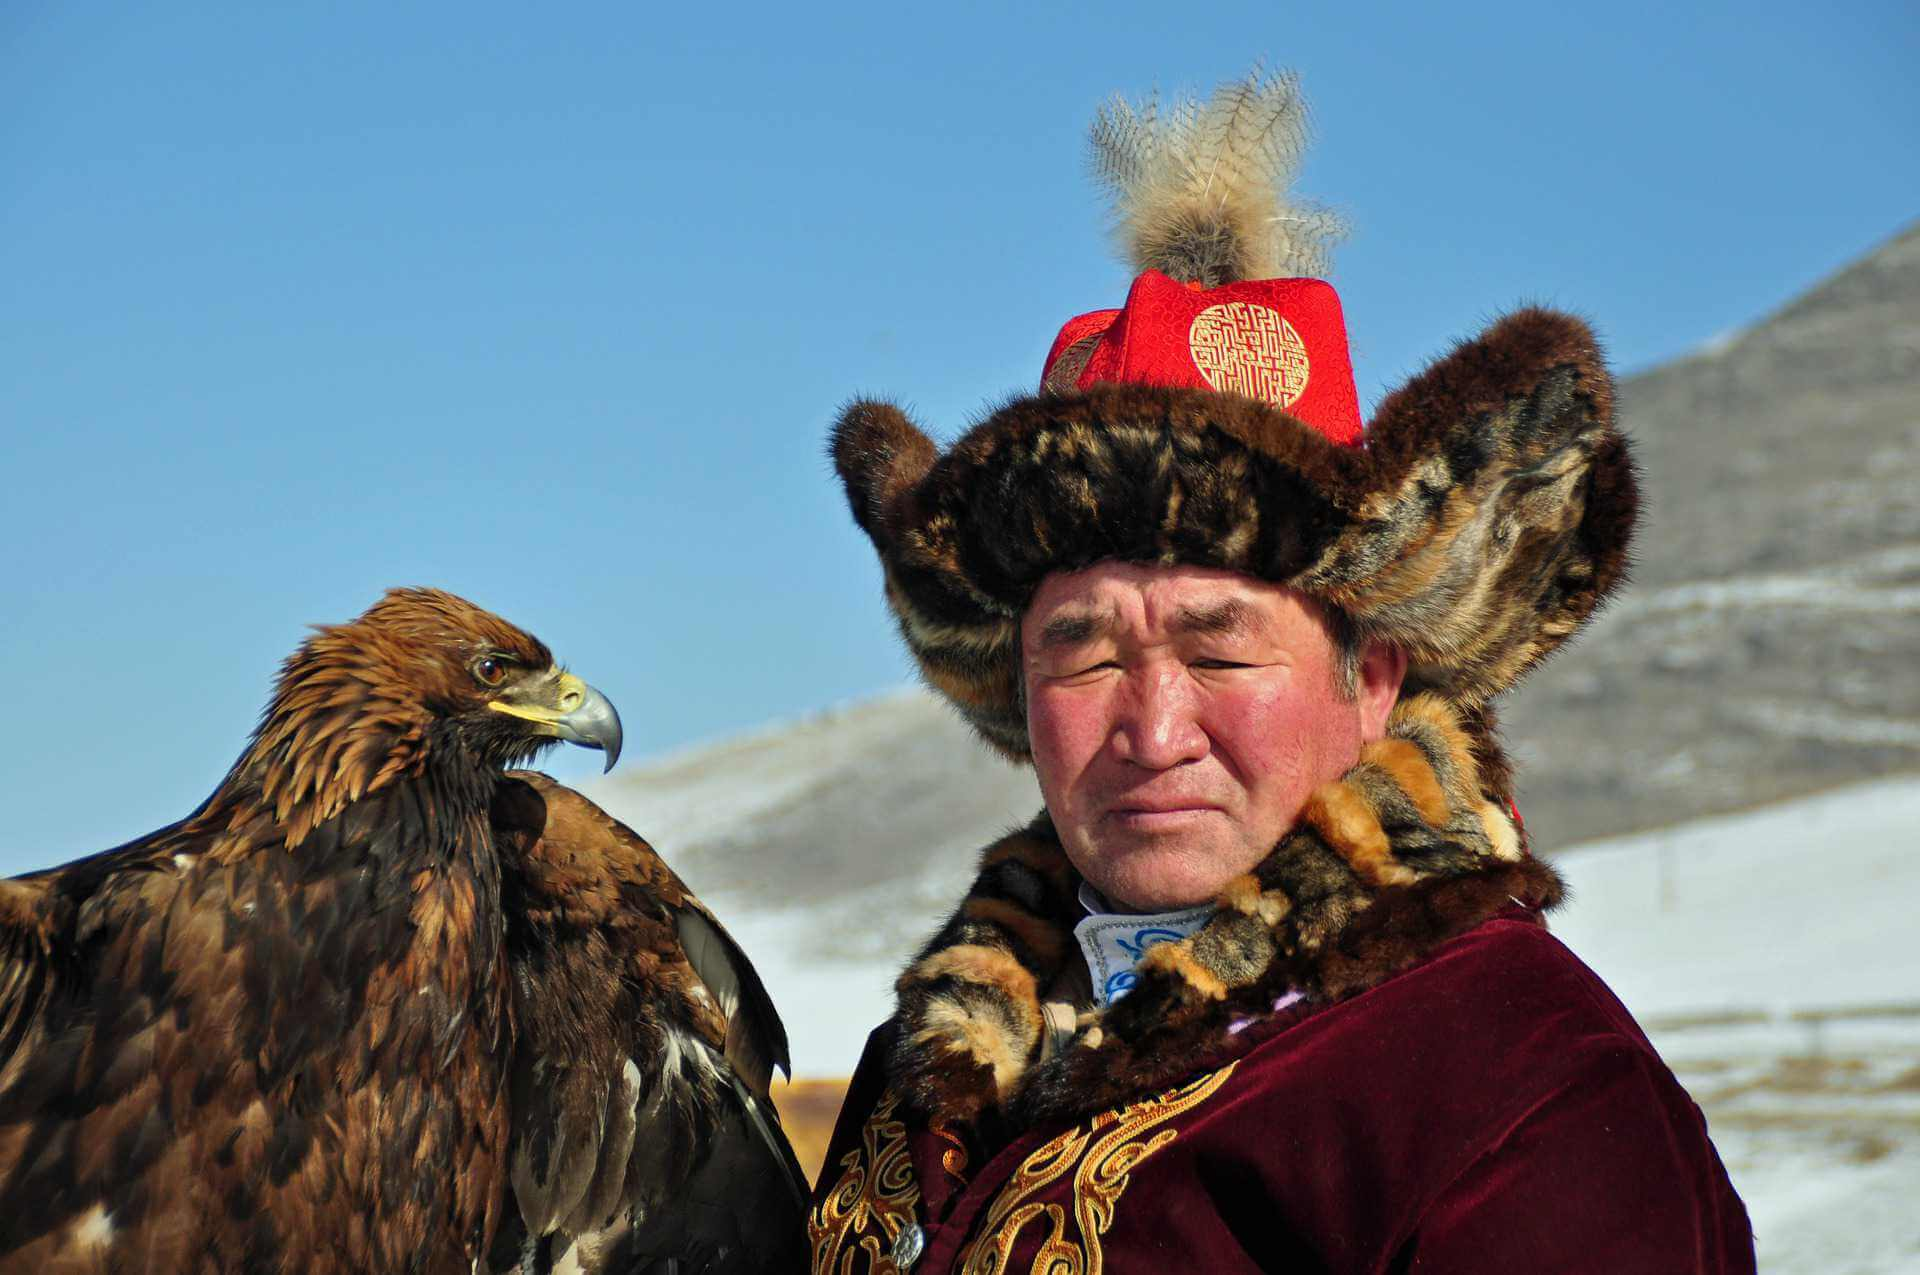 Asian falconer with eagle